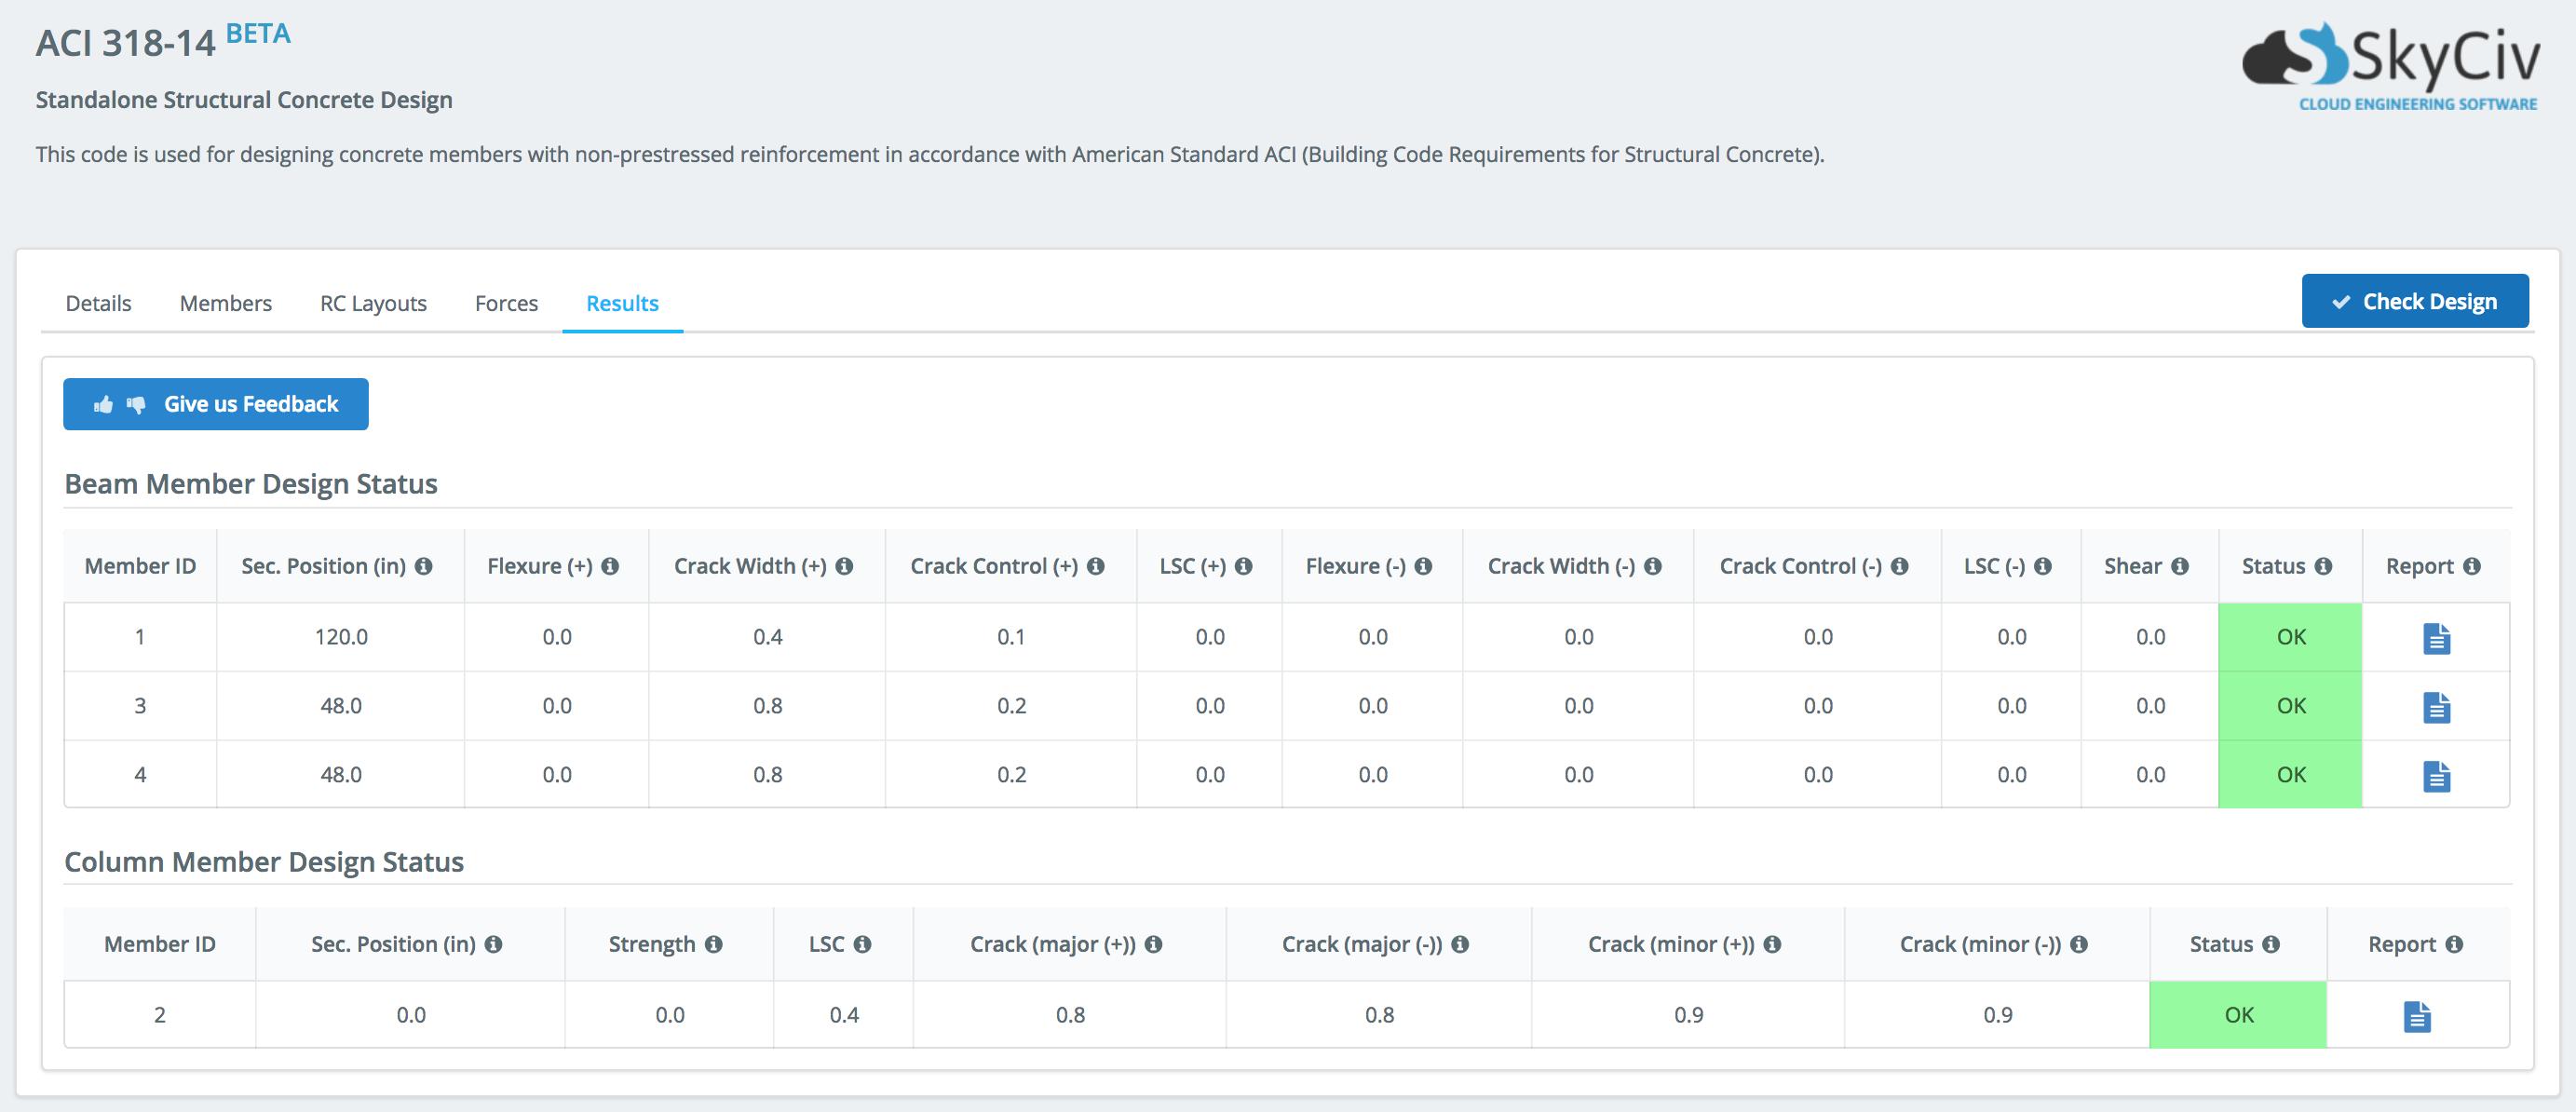 ACI-318 concrete design software showing results